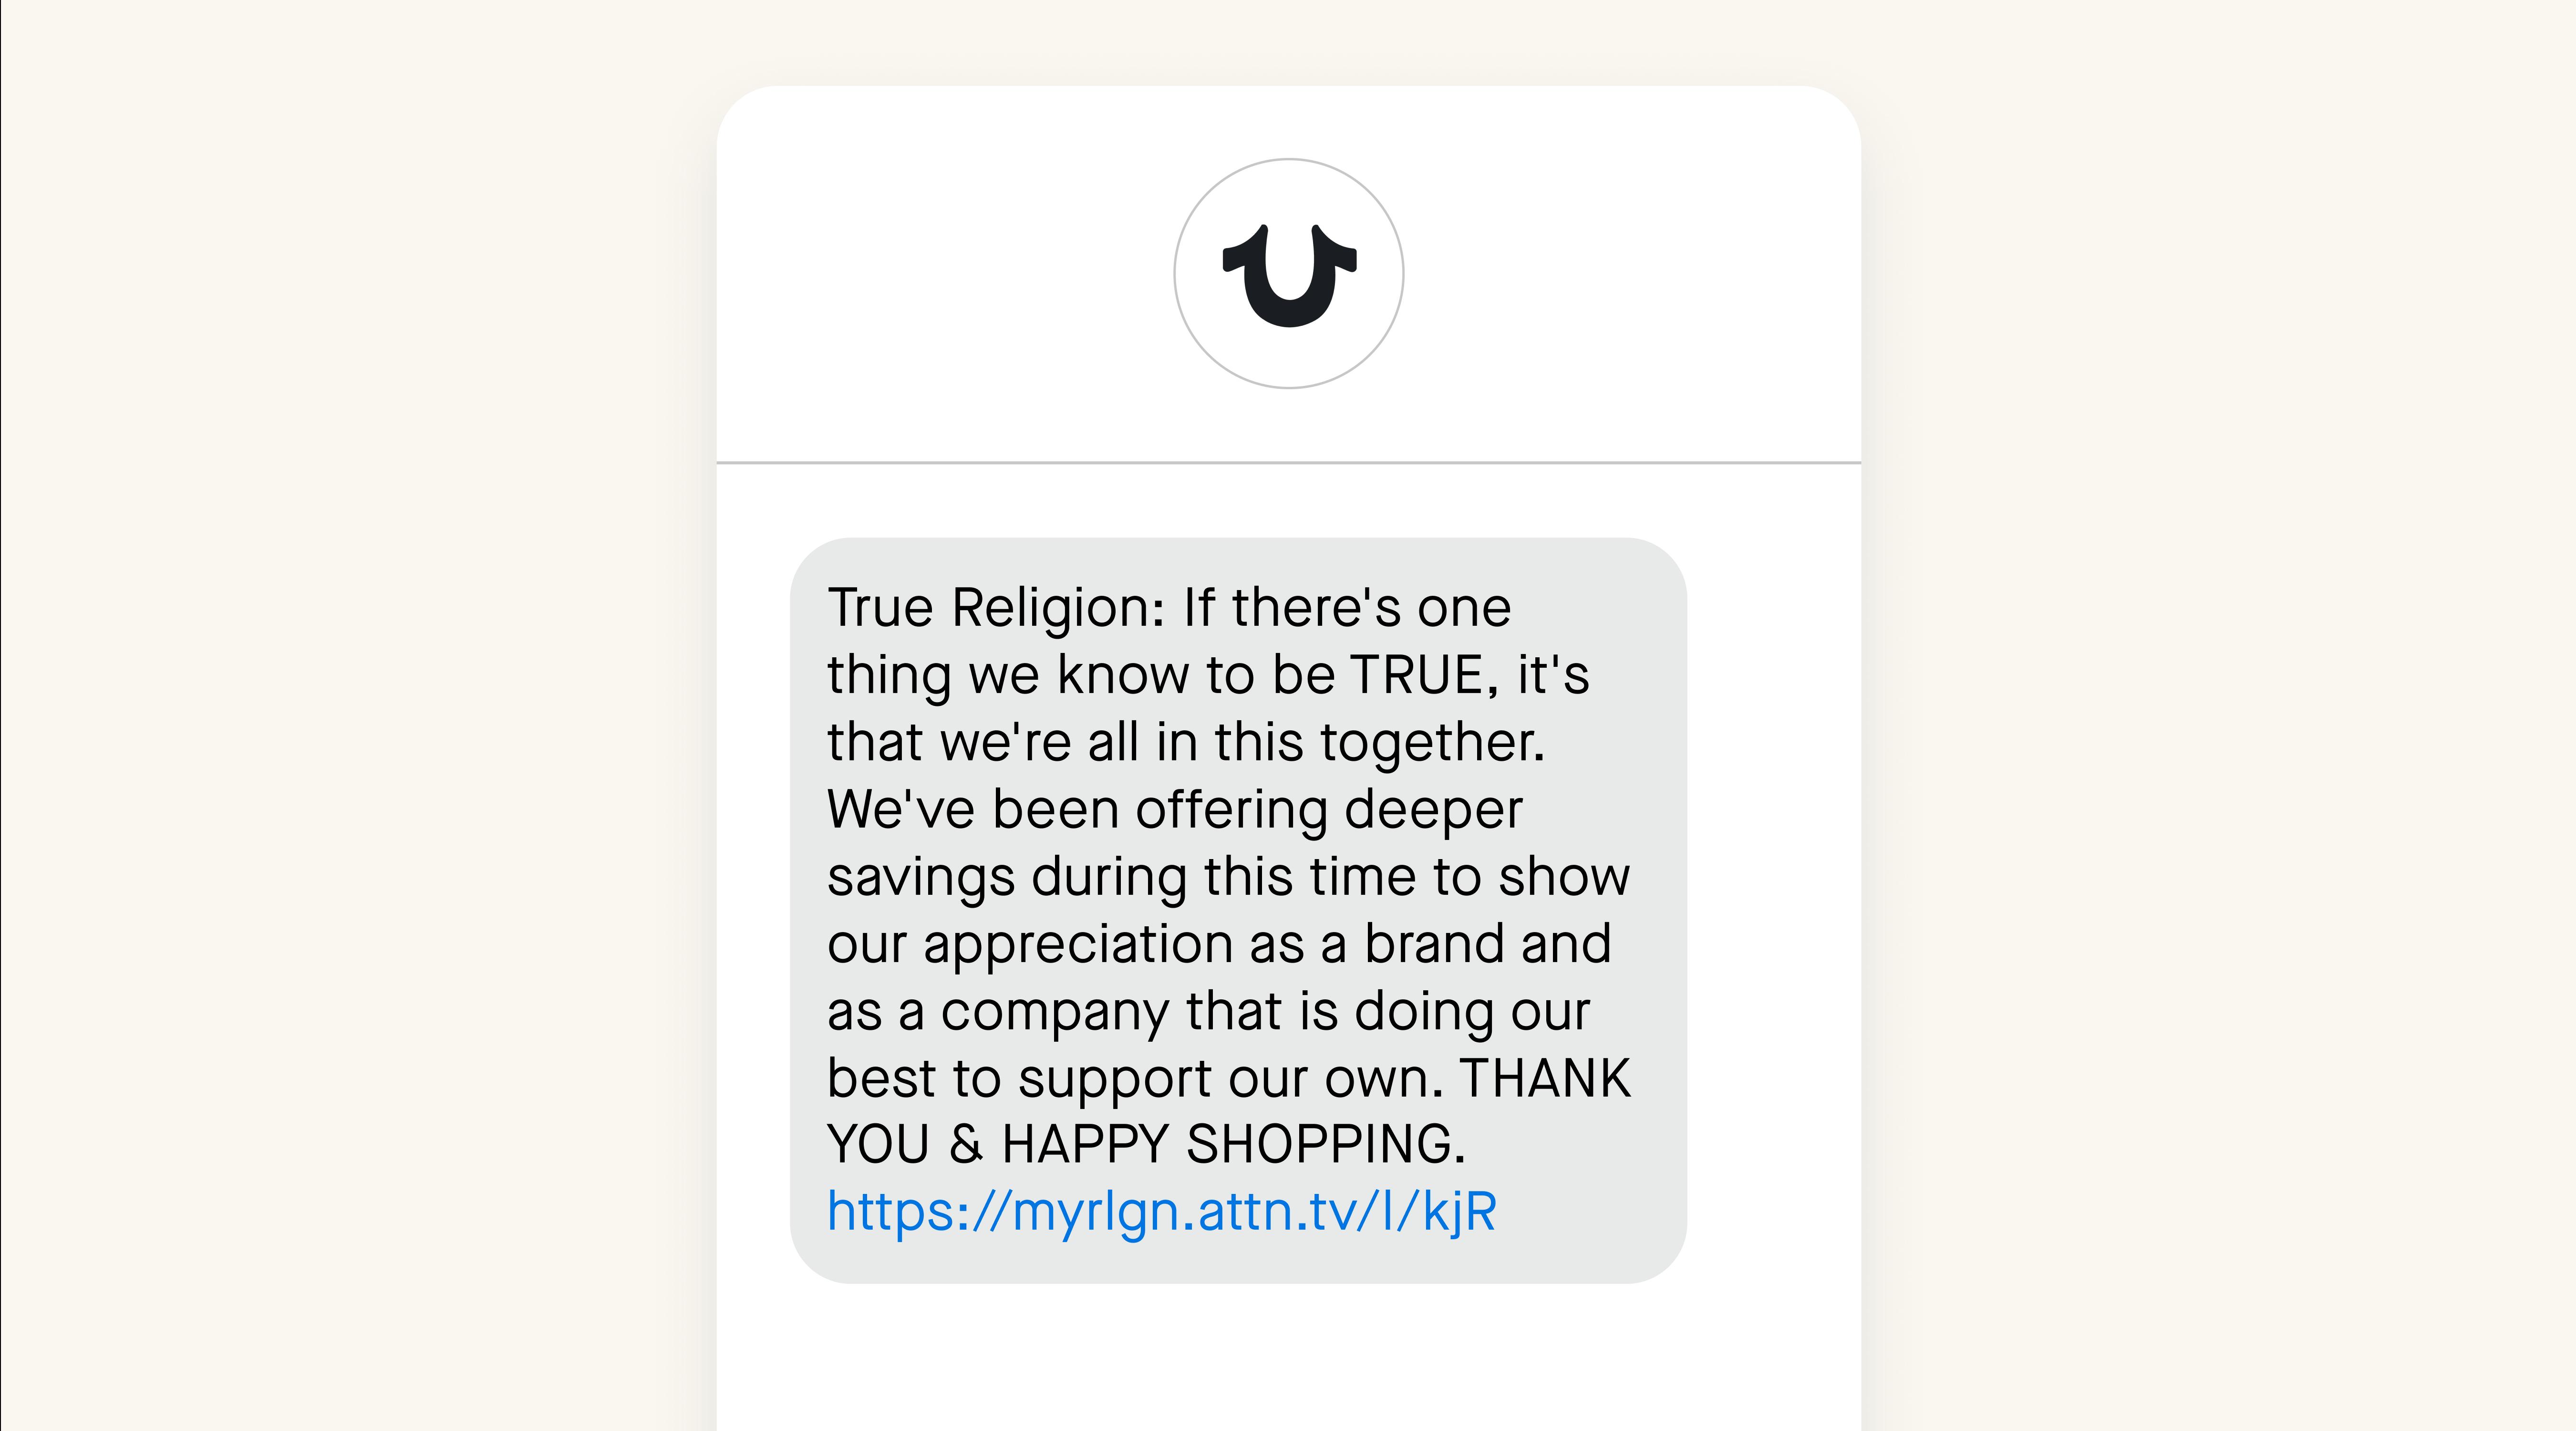 True Religion SMS example